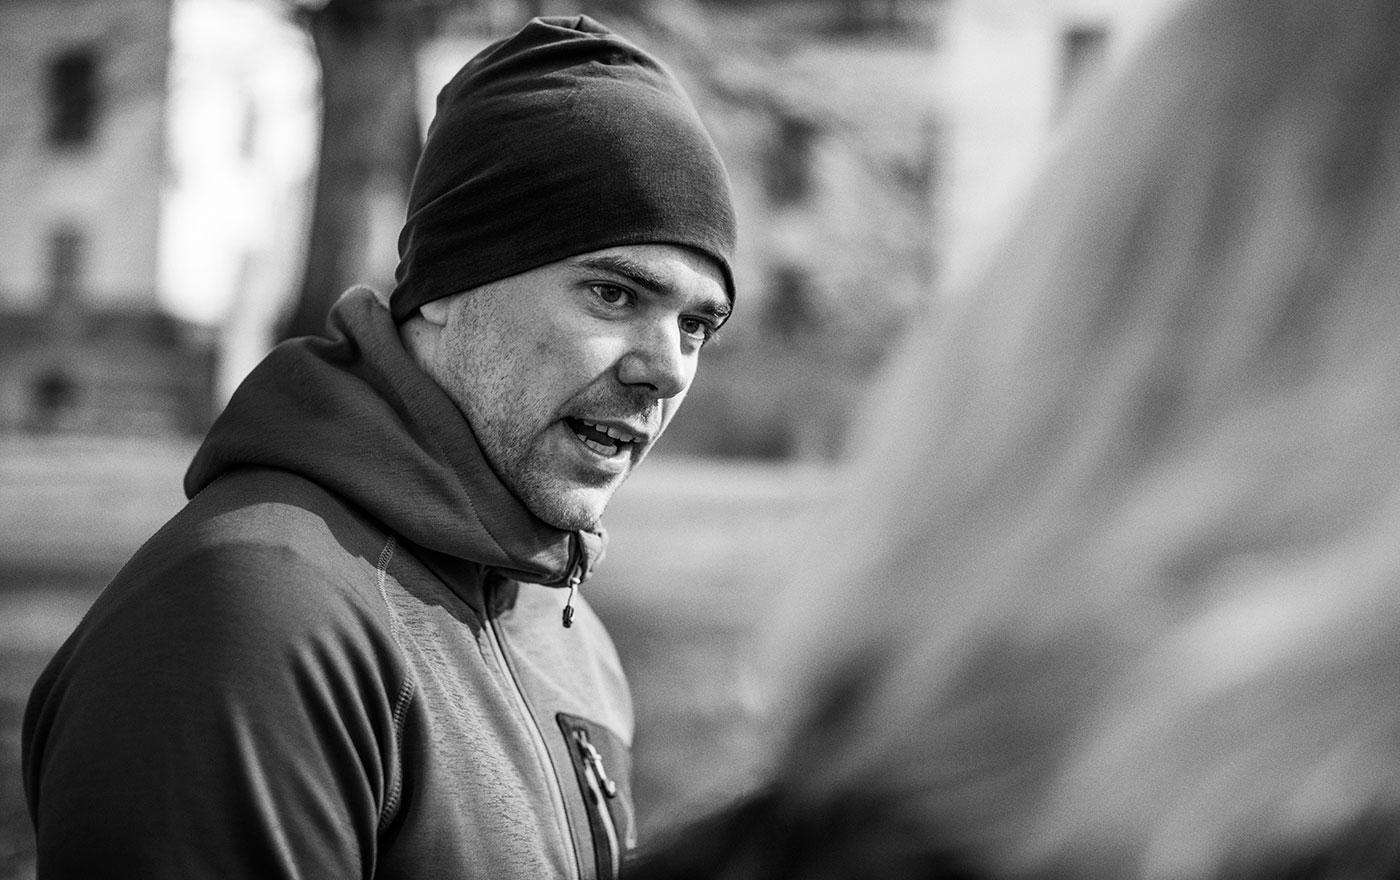 Fredrik Karlsson, Härliga Hunds hundcoach